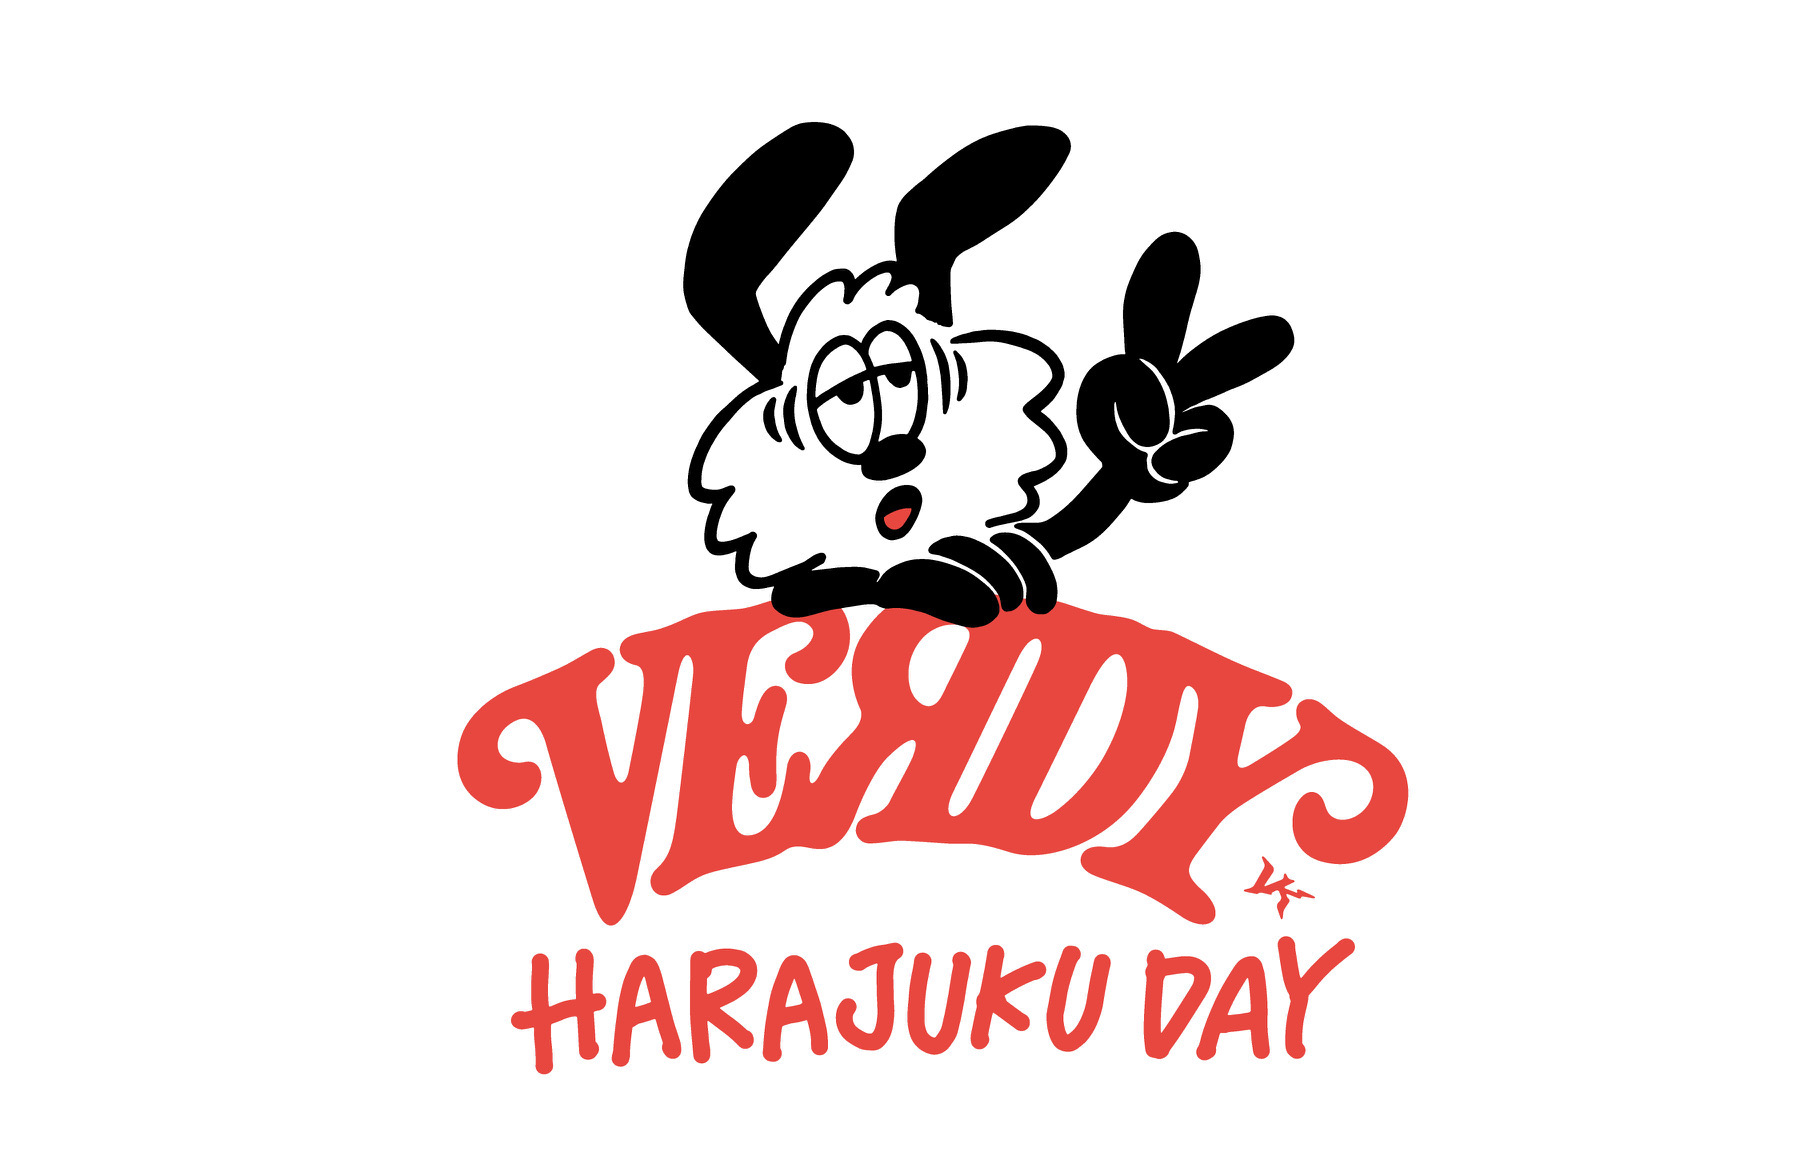 VERDY 主催「HARAJUKU DAY」 LEVI'S®原宿でオリジナルの一着作り